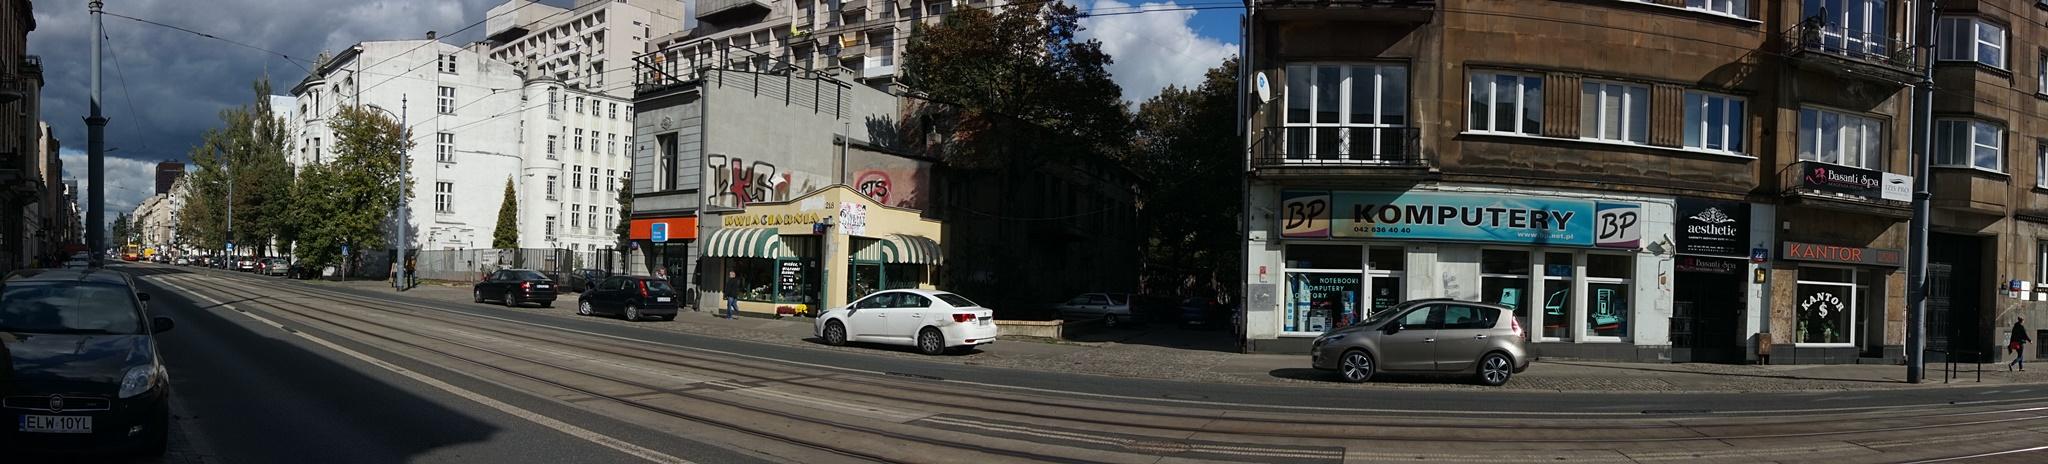 Piotrkowska 12